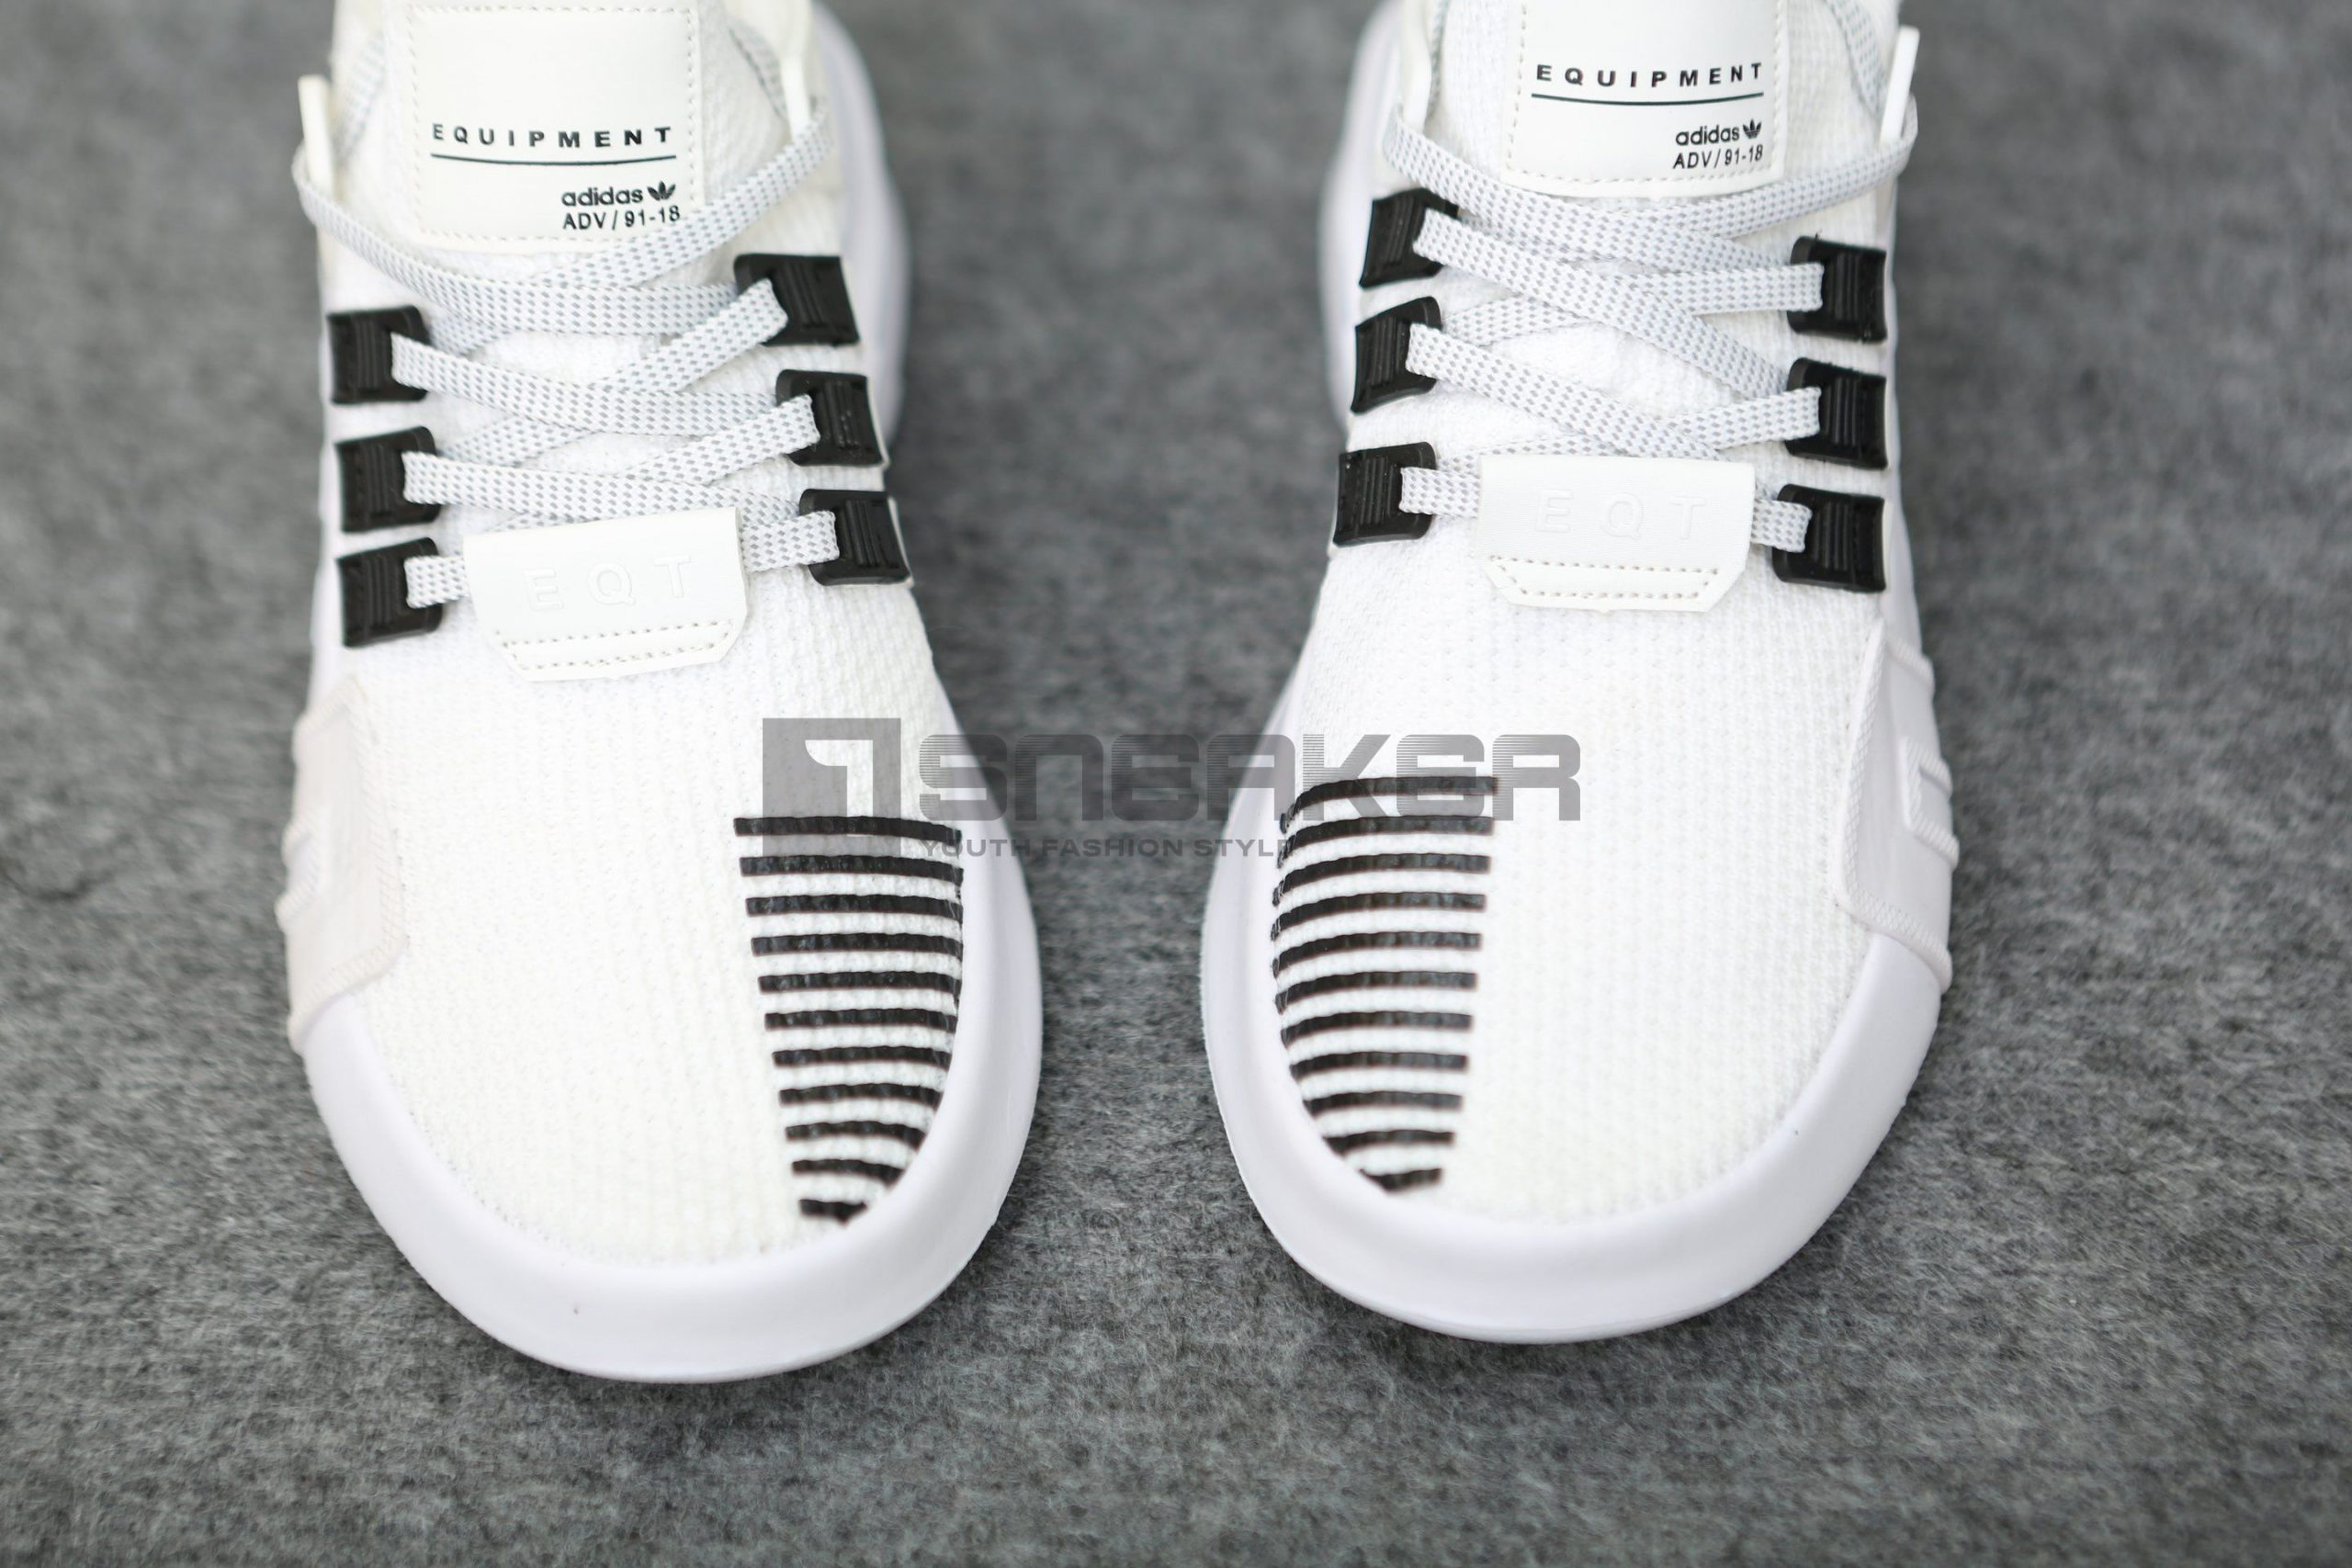 Adidas EQT Bask ADV trang den phan quang 9 scaled